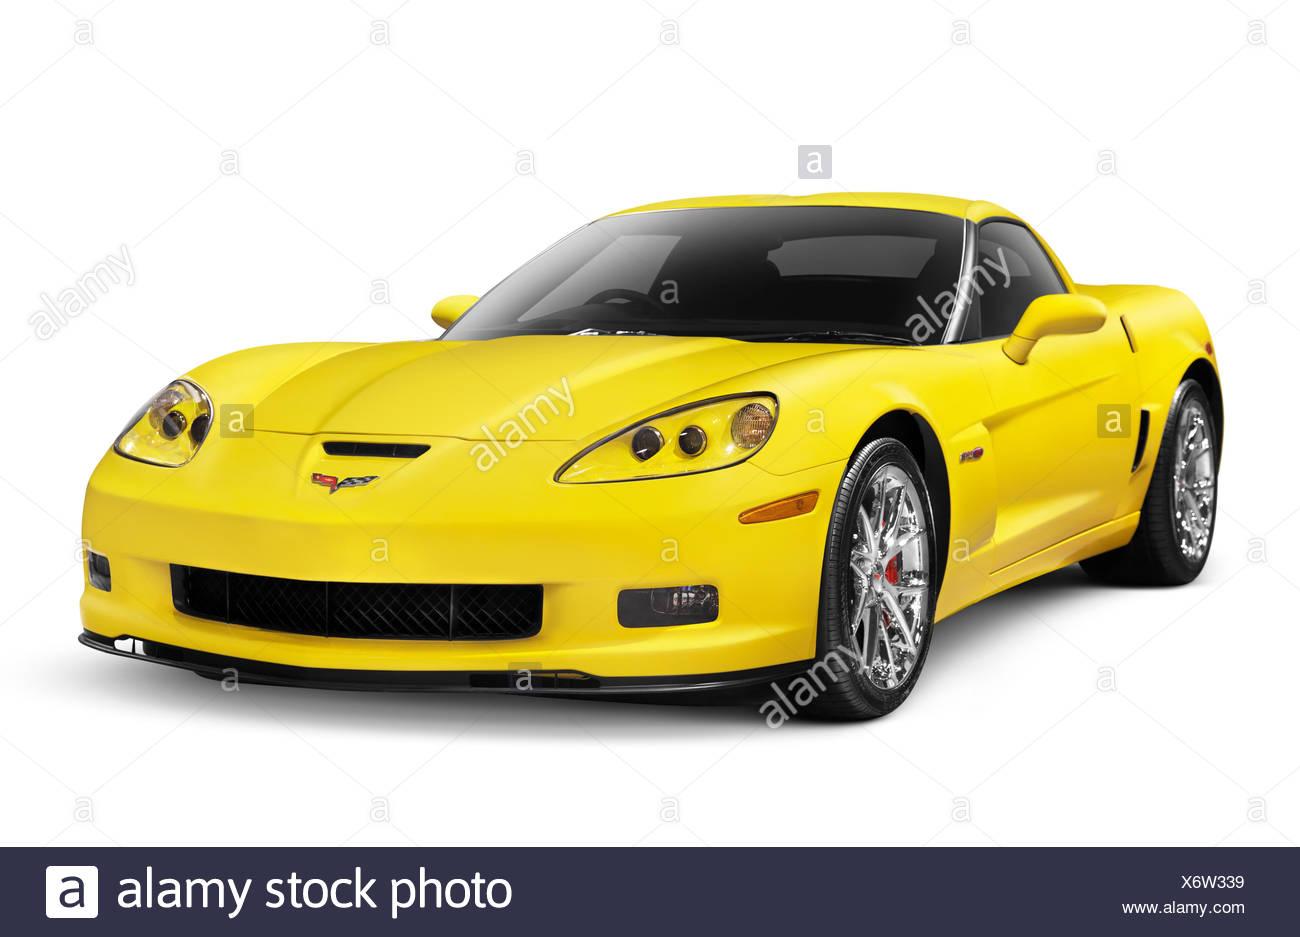 Yellow 2010 Chevrolet Corvette Z06 sports car - Stock Image